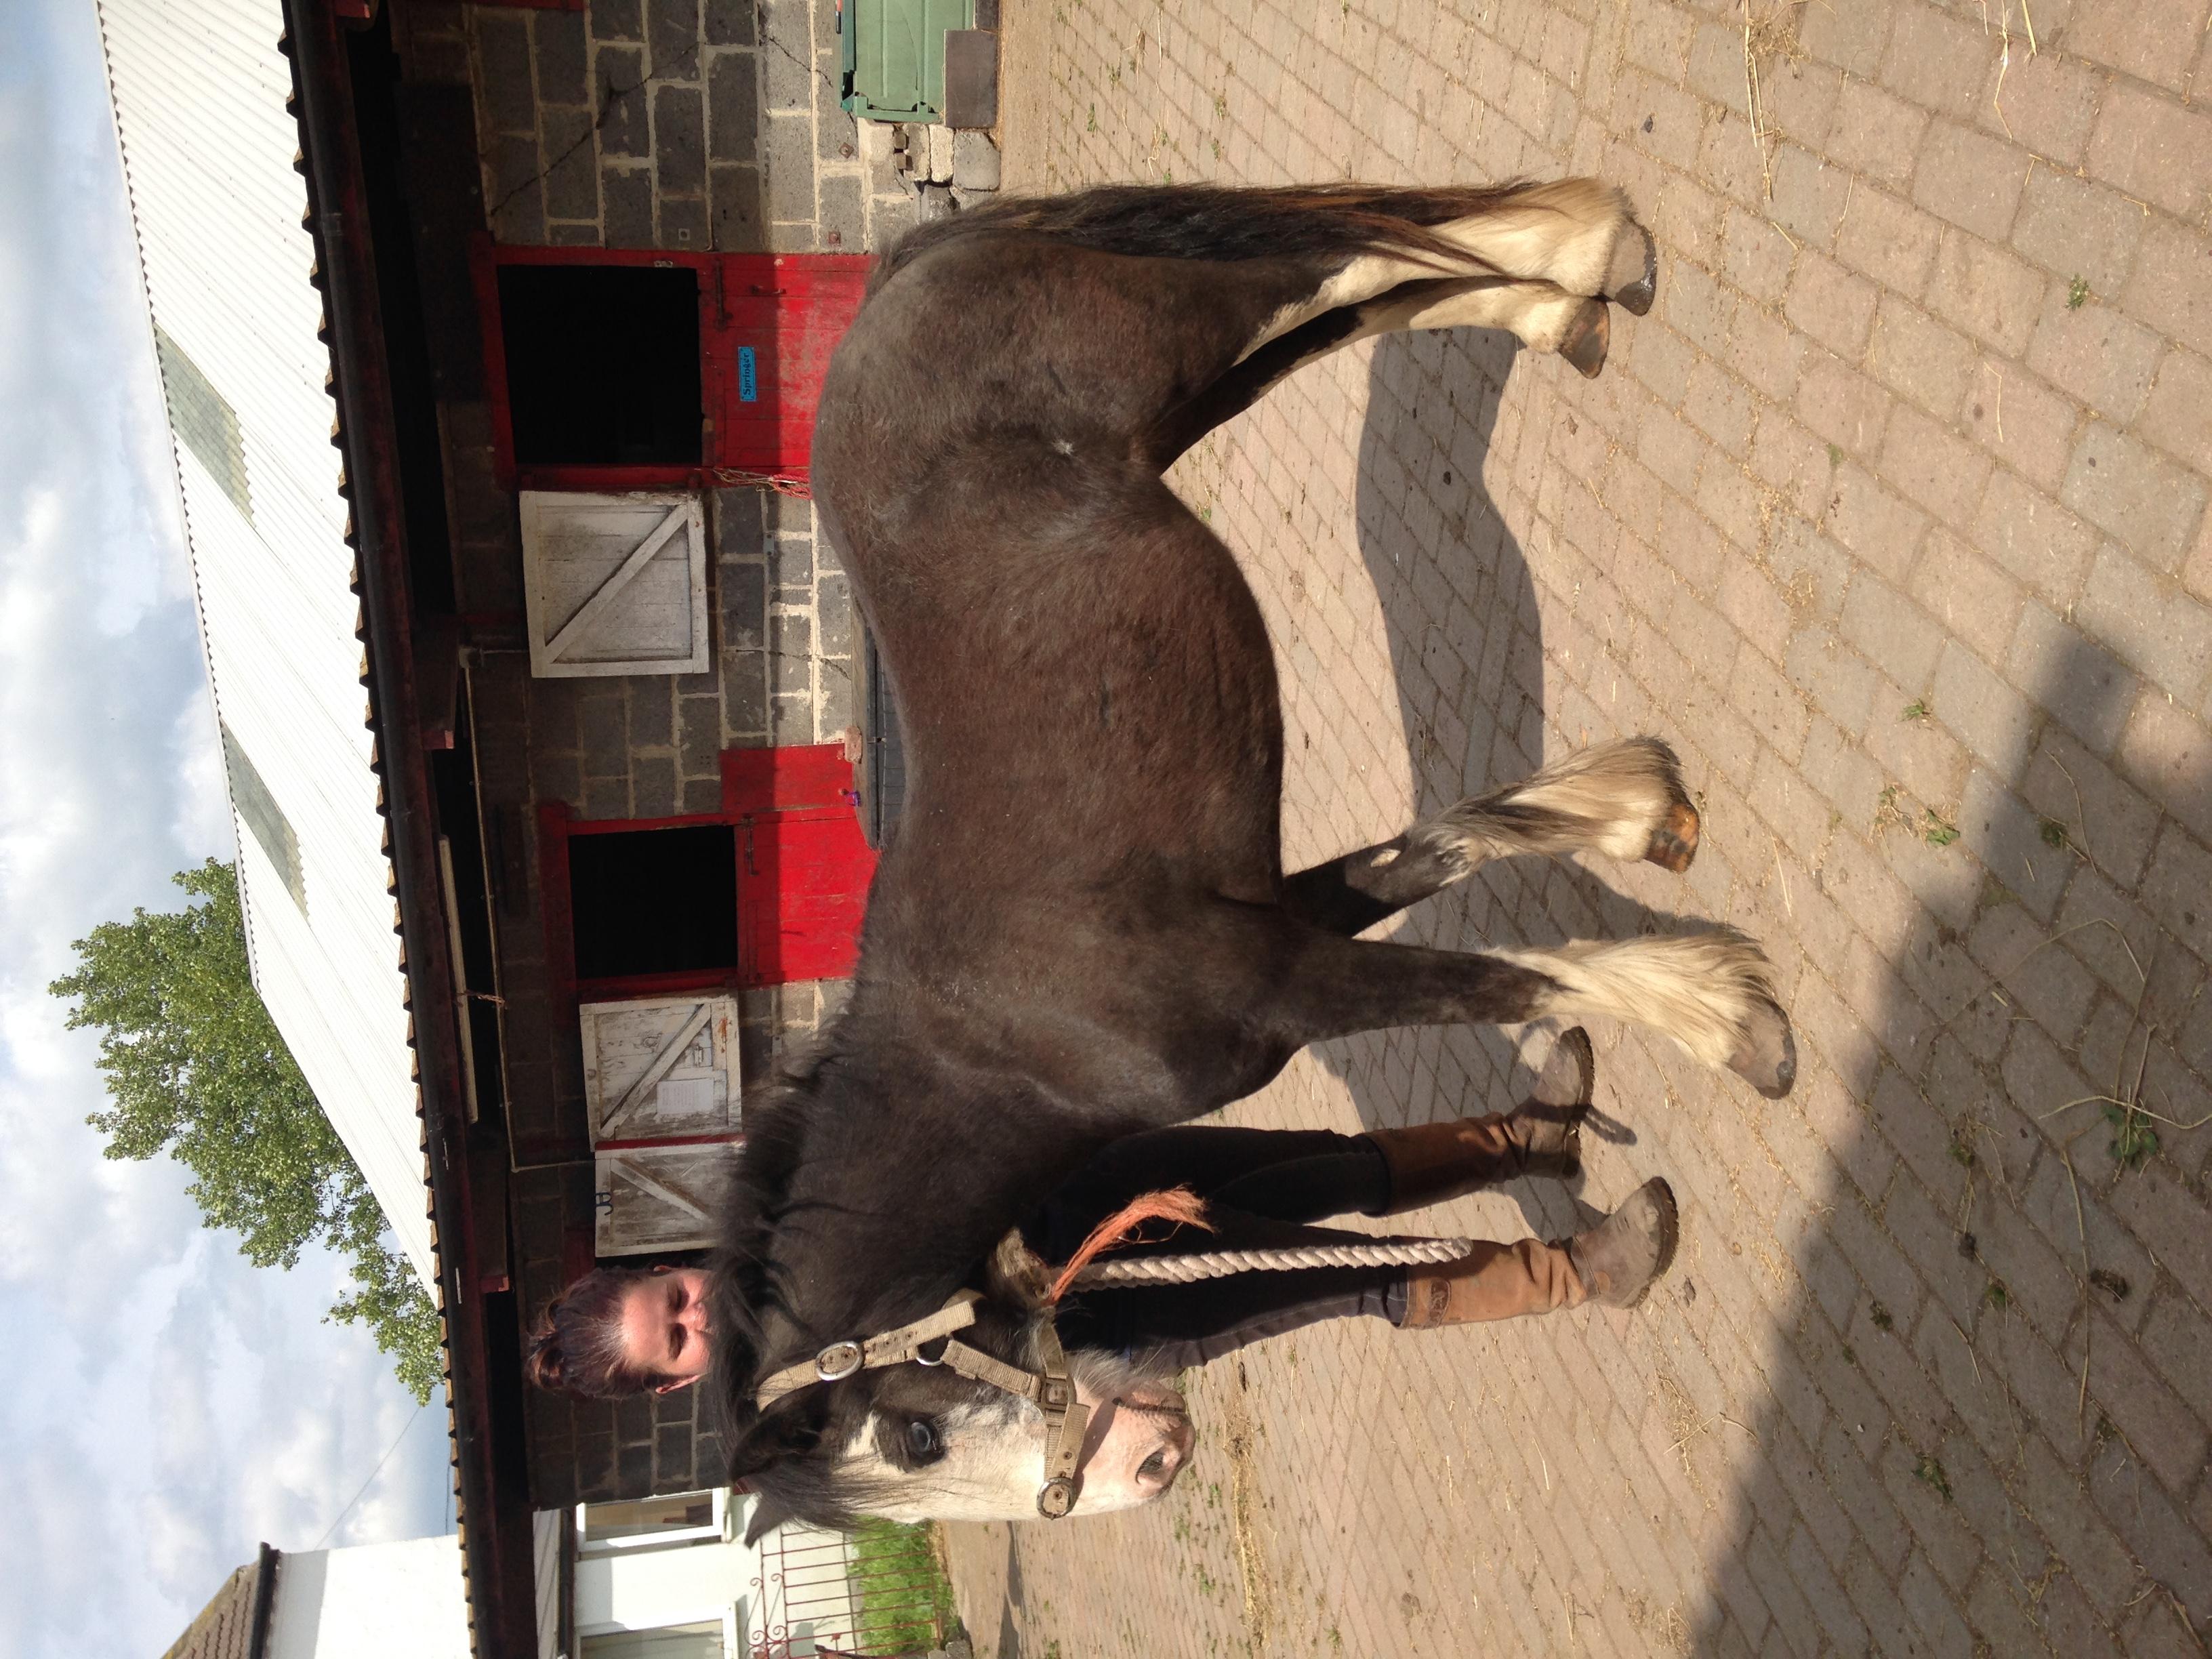 Young Ponies Fir Tree Farm Equestrian Centre